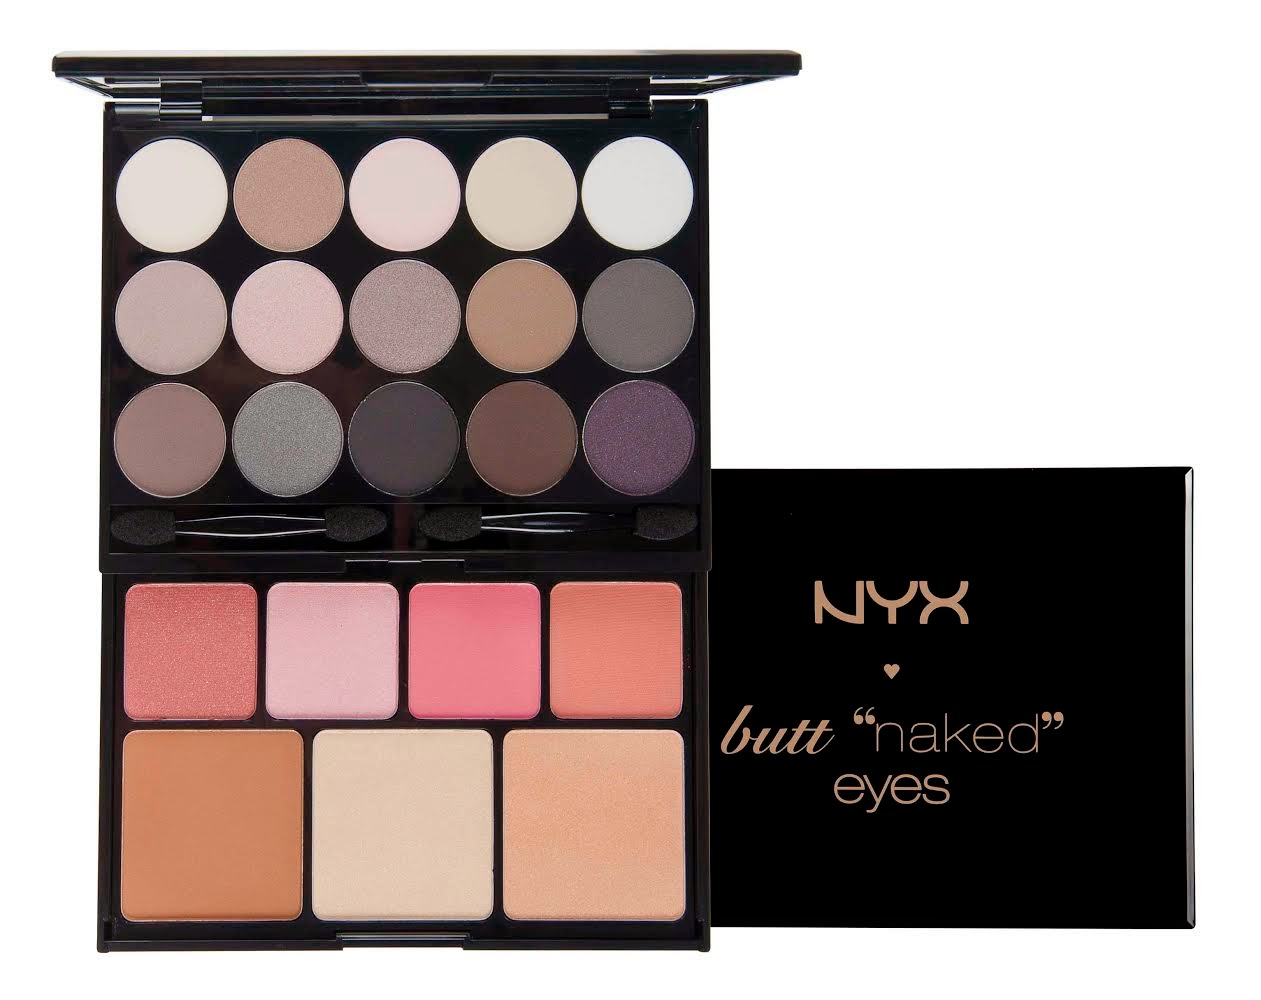 NYX Christmas 2014 palette